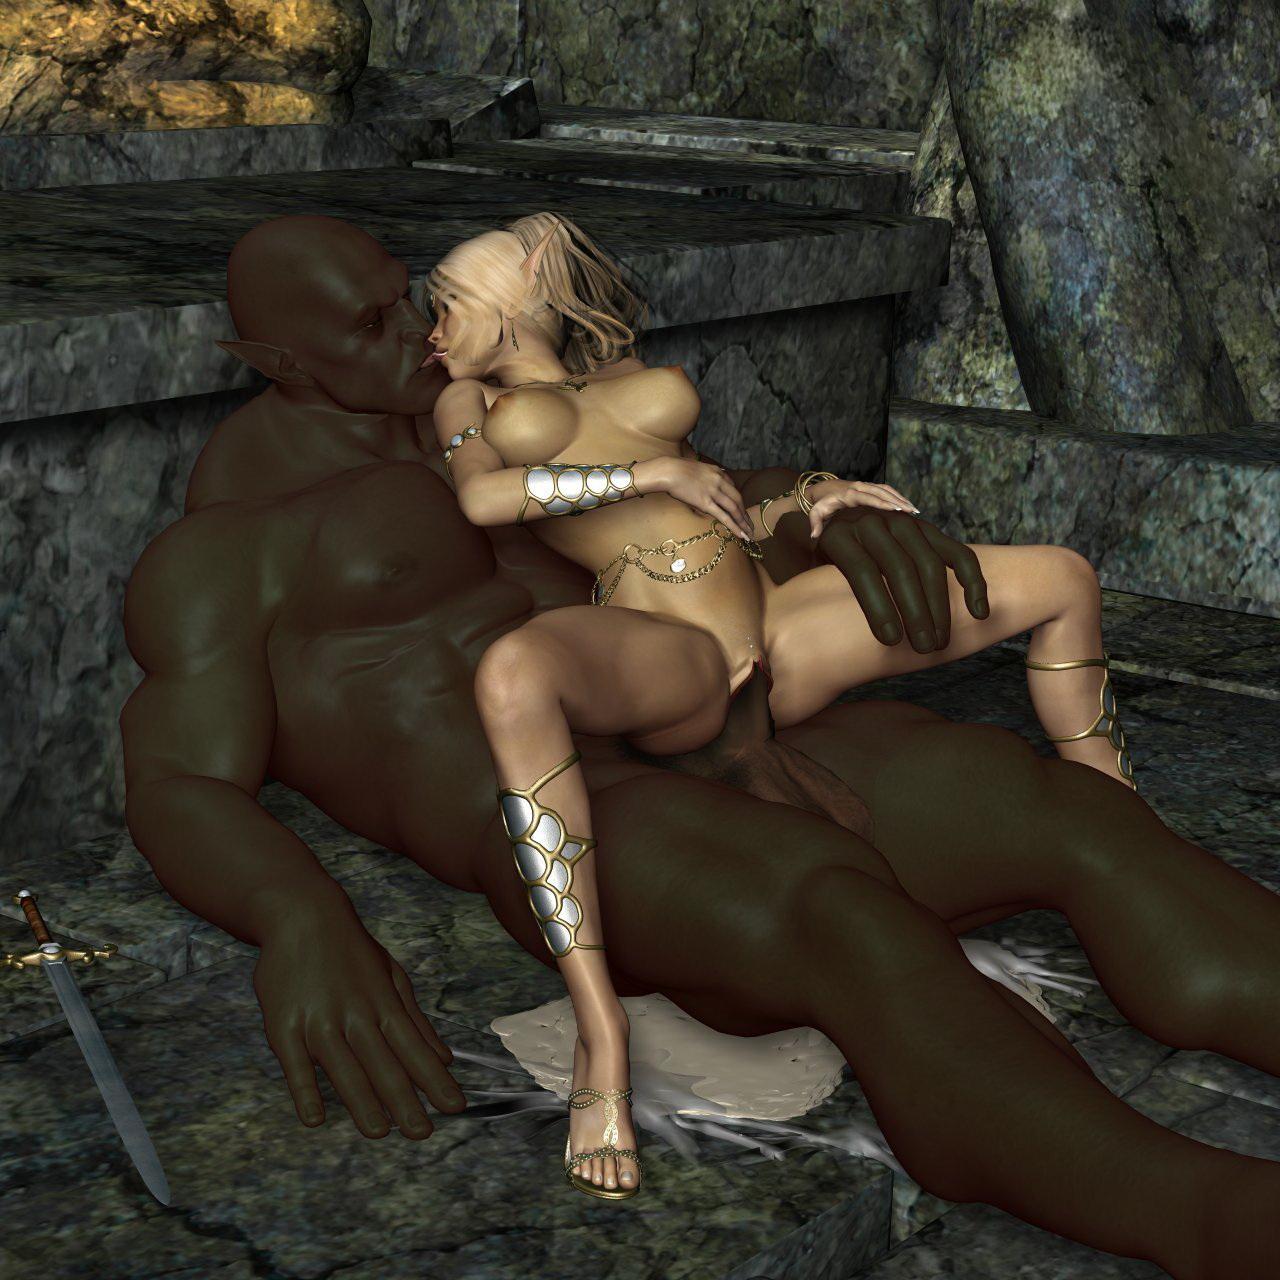 Pic elfa porno free pics adult clip